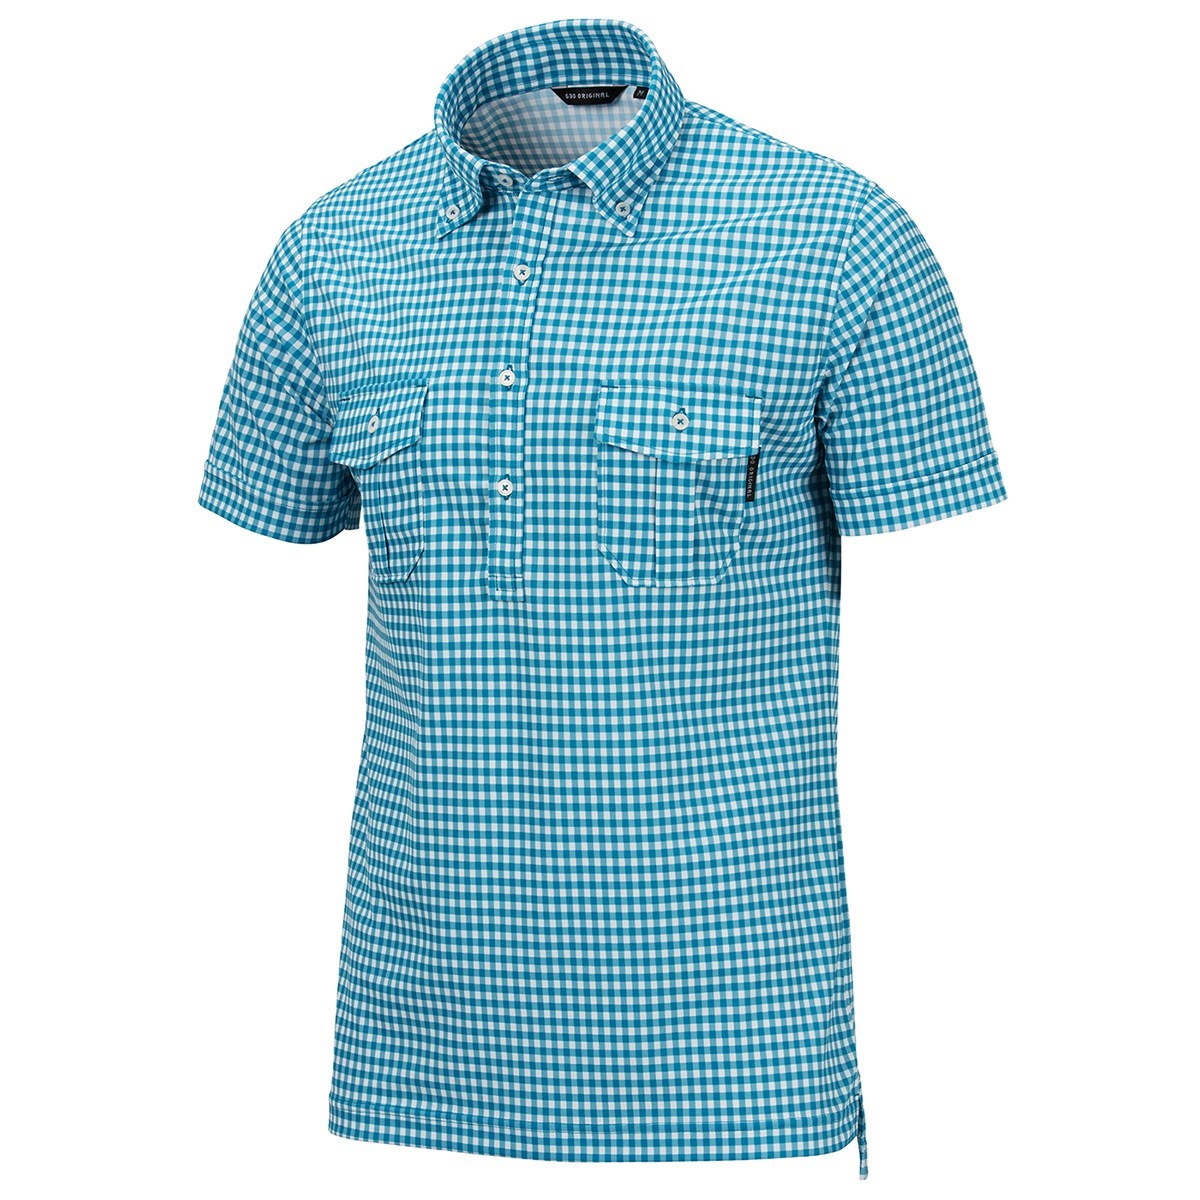 GDO オリジナル 半袖Wポケットボタンダウンシャツ